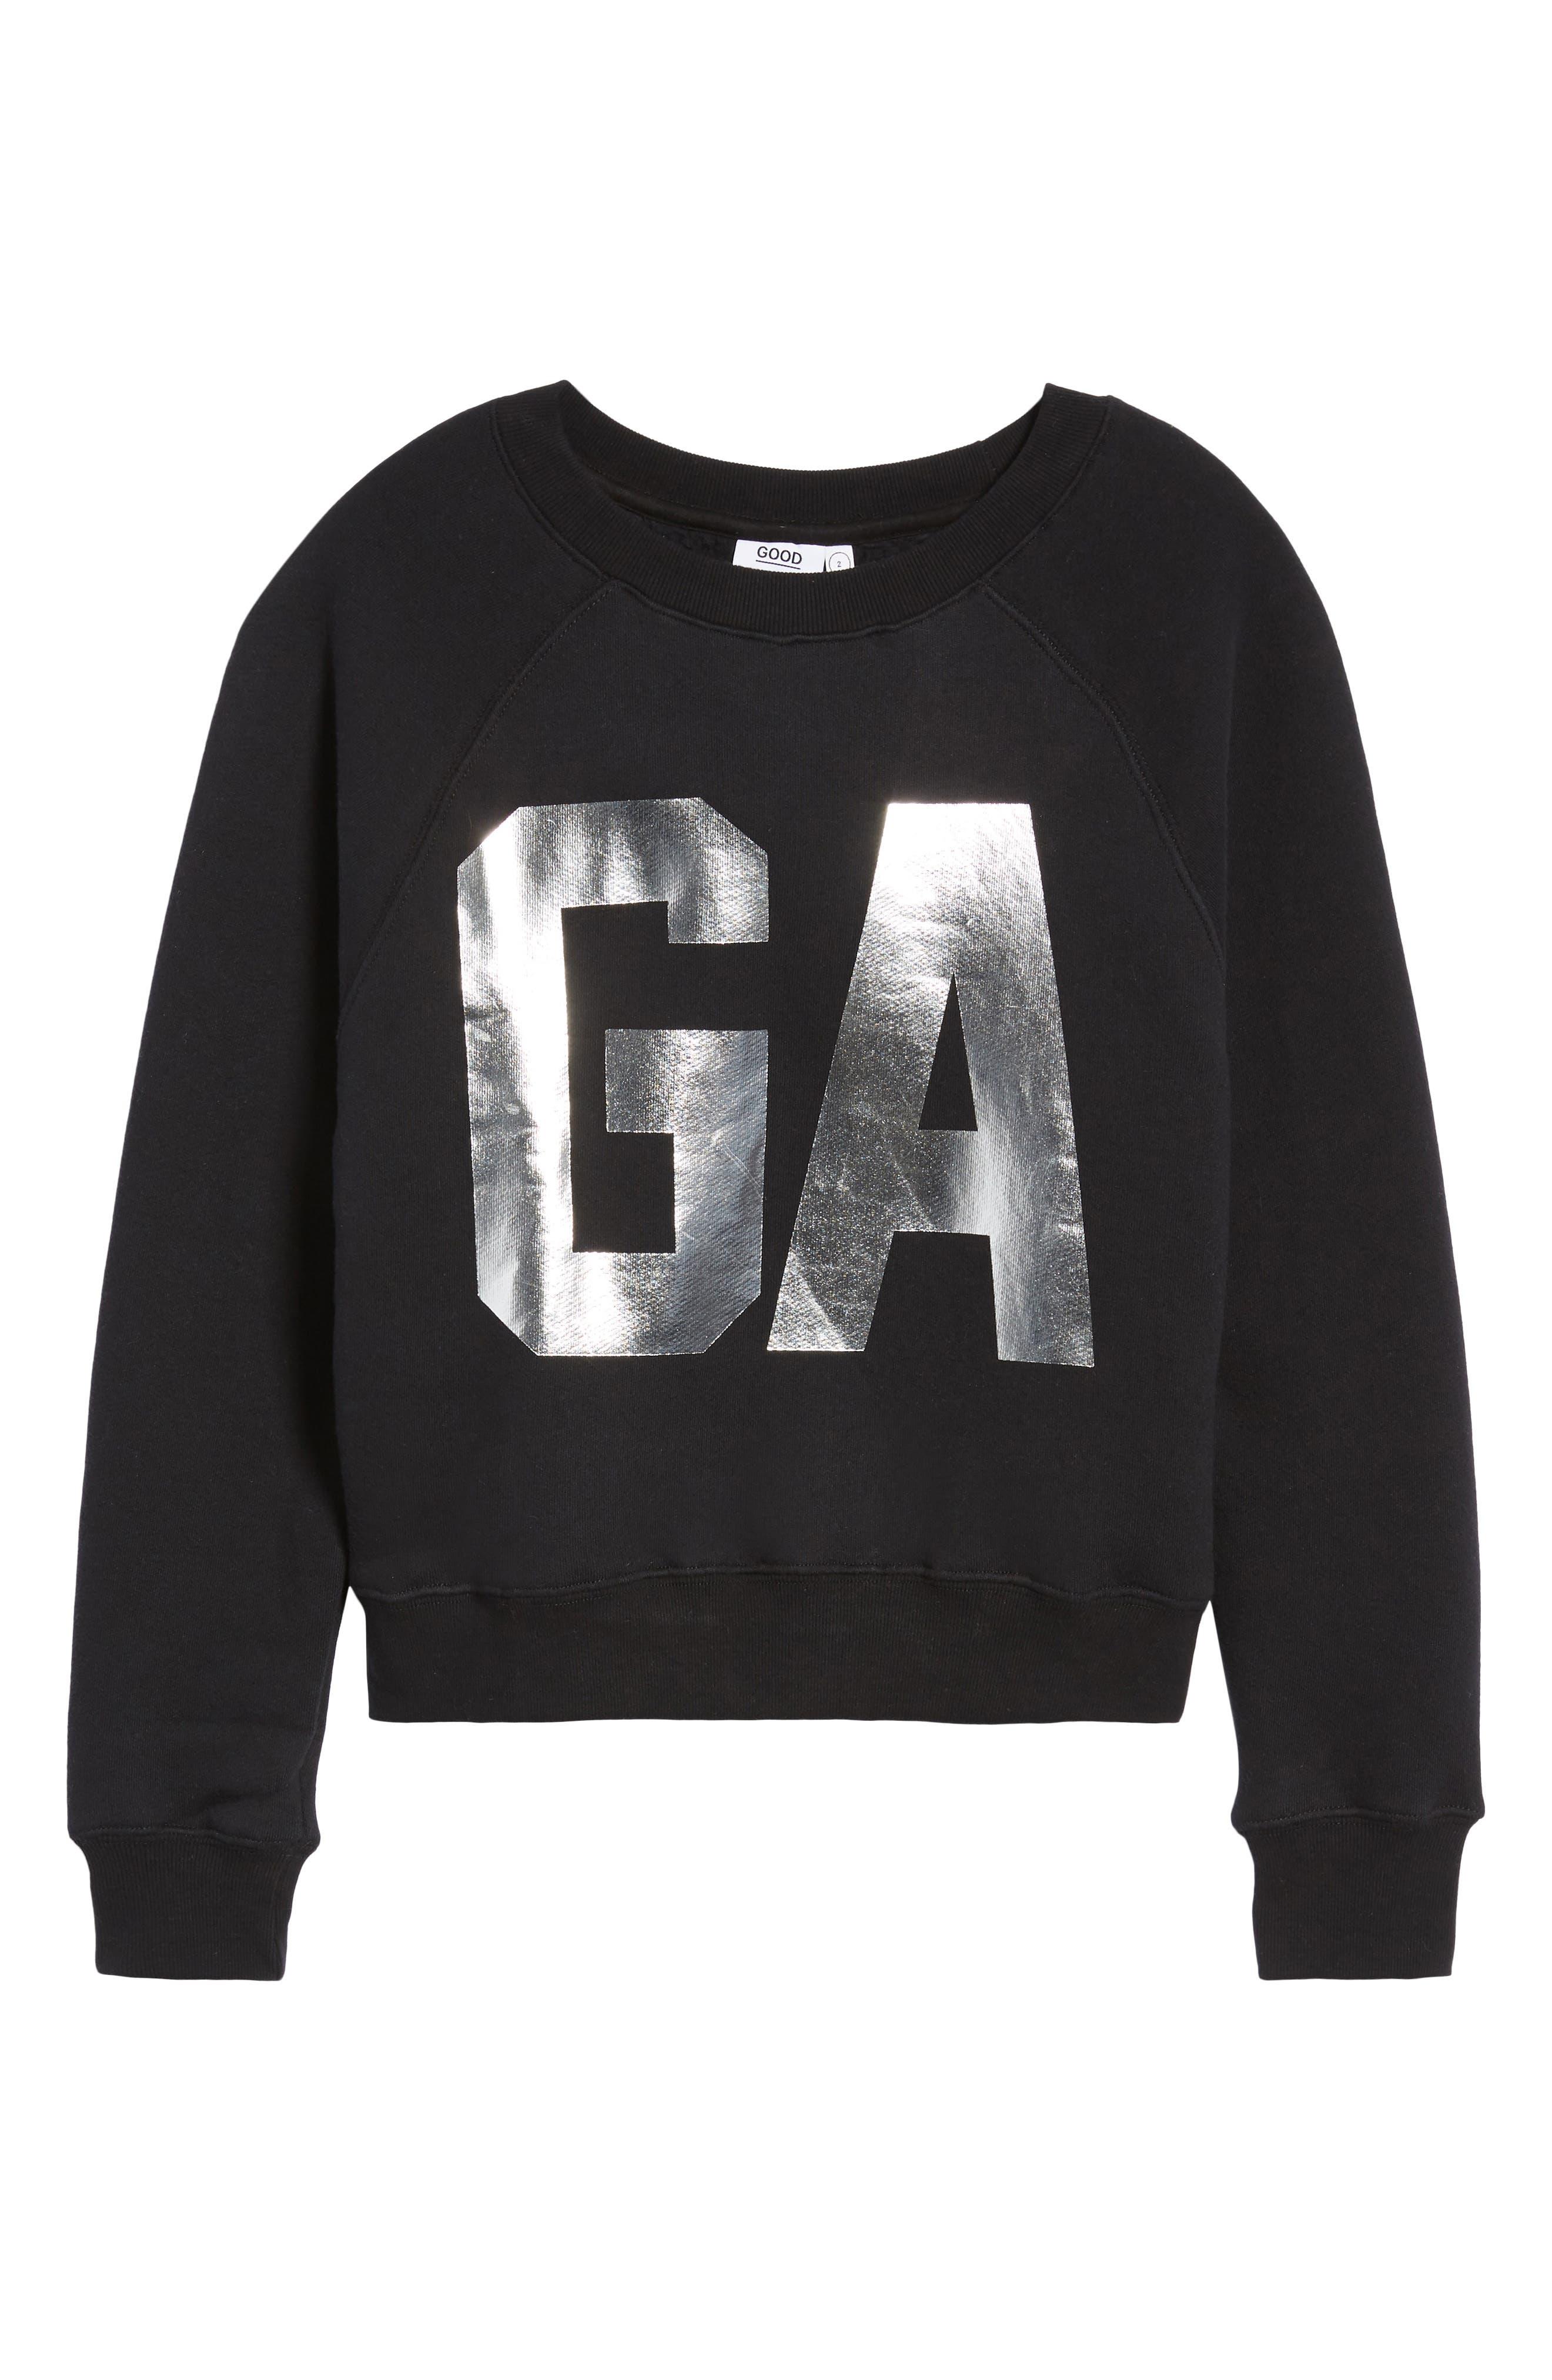 Goodies Varsity Sweatshirt,                             Alternate thumbnail 4, color,                             BLACK002